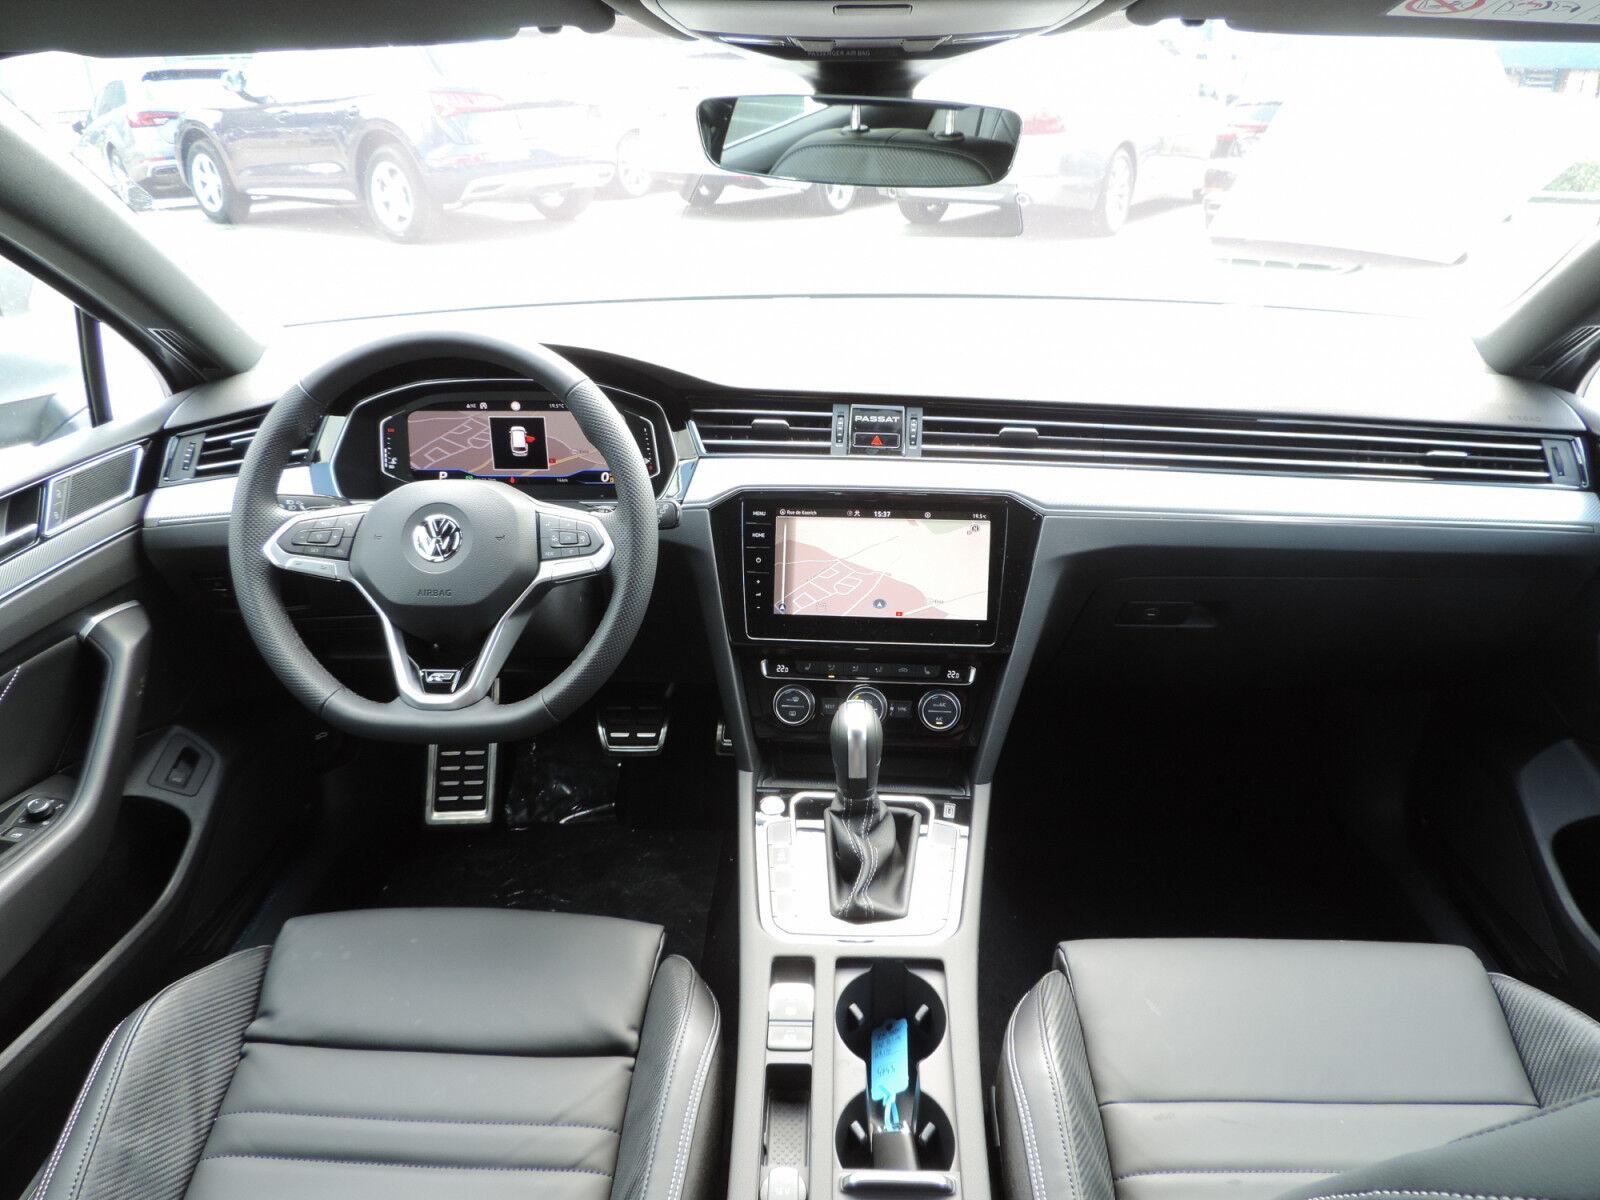 Volkswagen Passat Variant 2.0 TSI R-Line DSG CUIR GPS ACC LANE NEUVE 8/15